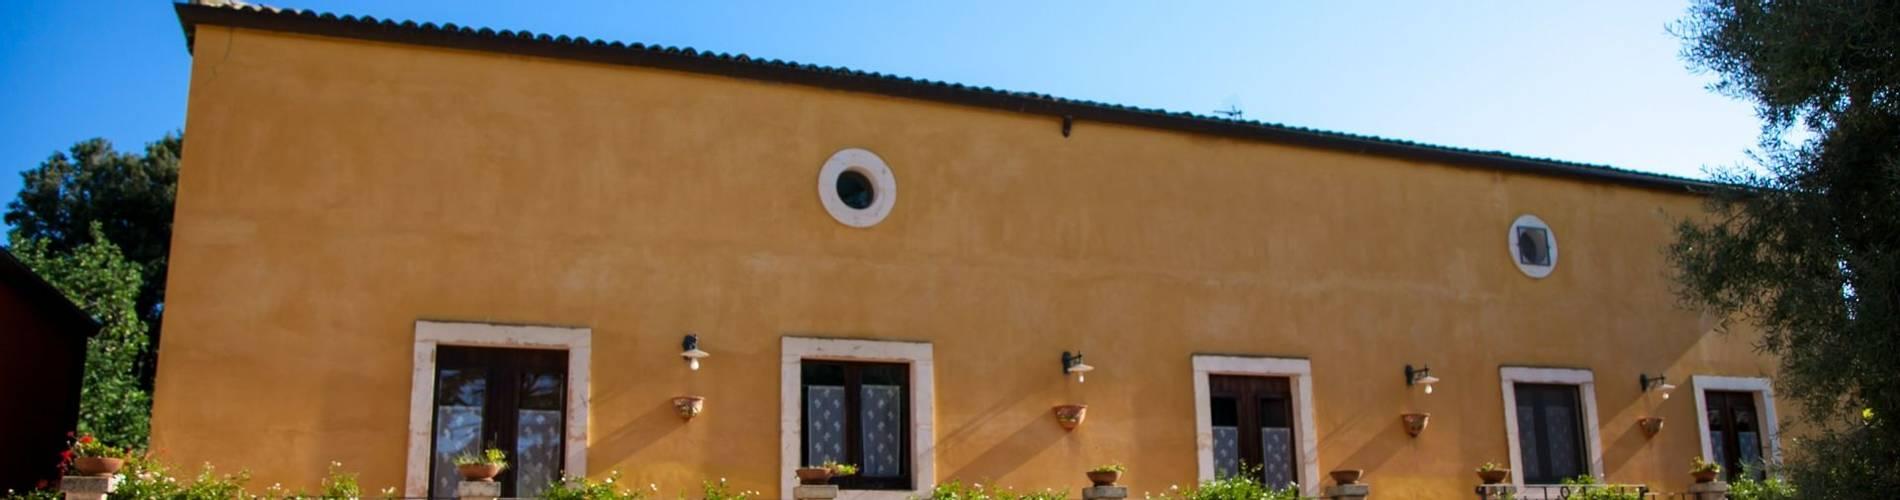 Il Paesino, Sicily, Italy (5).jpg